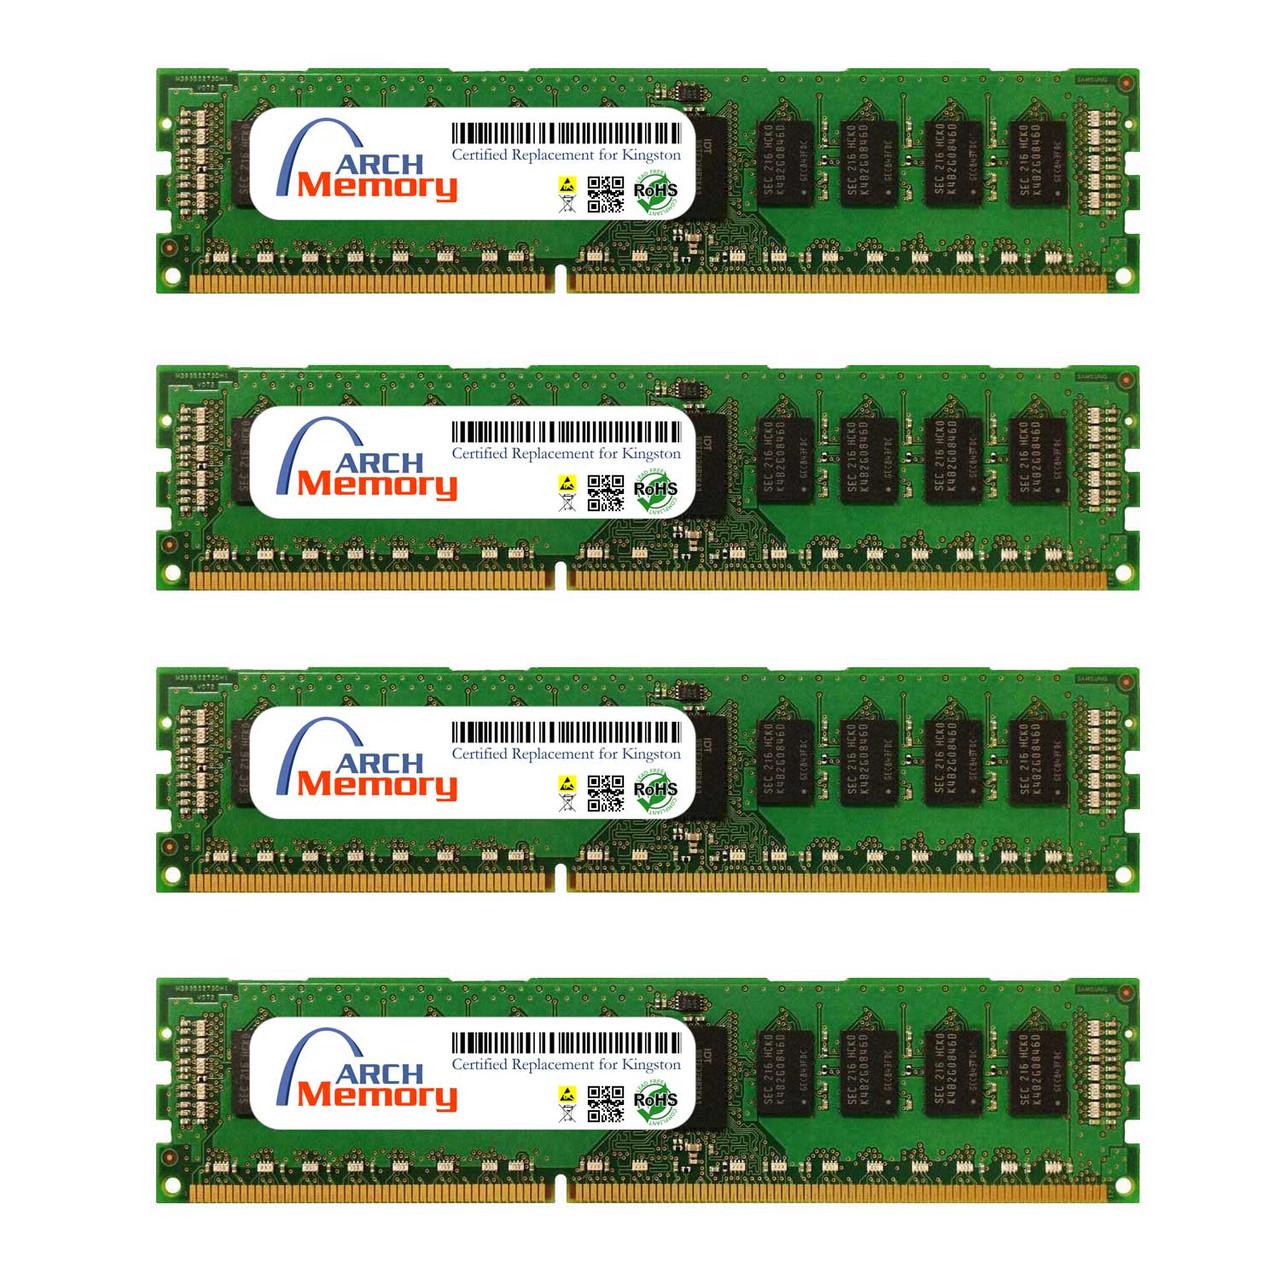 8GB D1G72K110K4 kit (4 x 8 GB) DDR3 1600MHz 240-Pin ECC UDIMM RAM | Kingston Replacement Memory